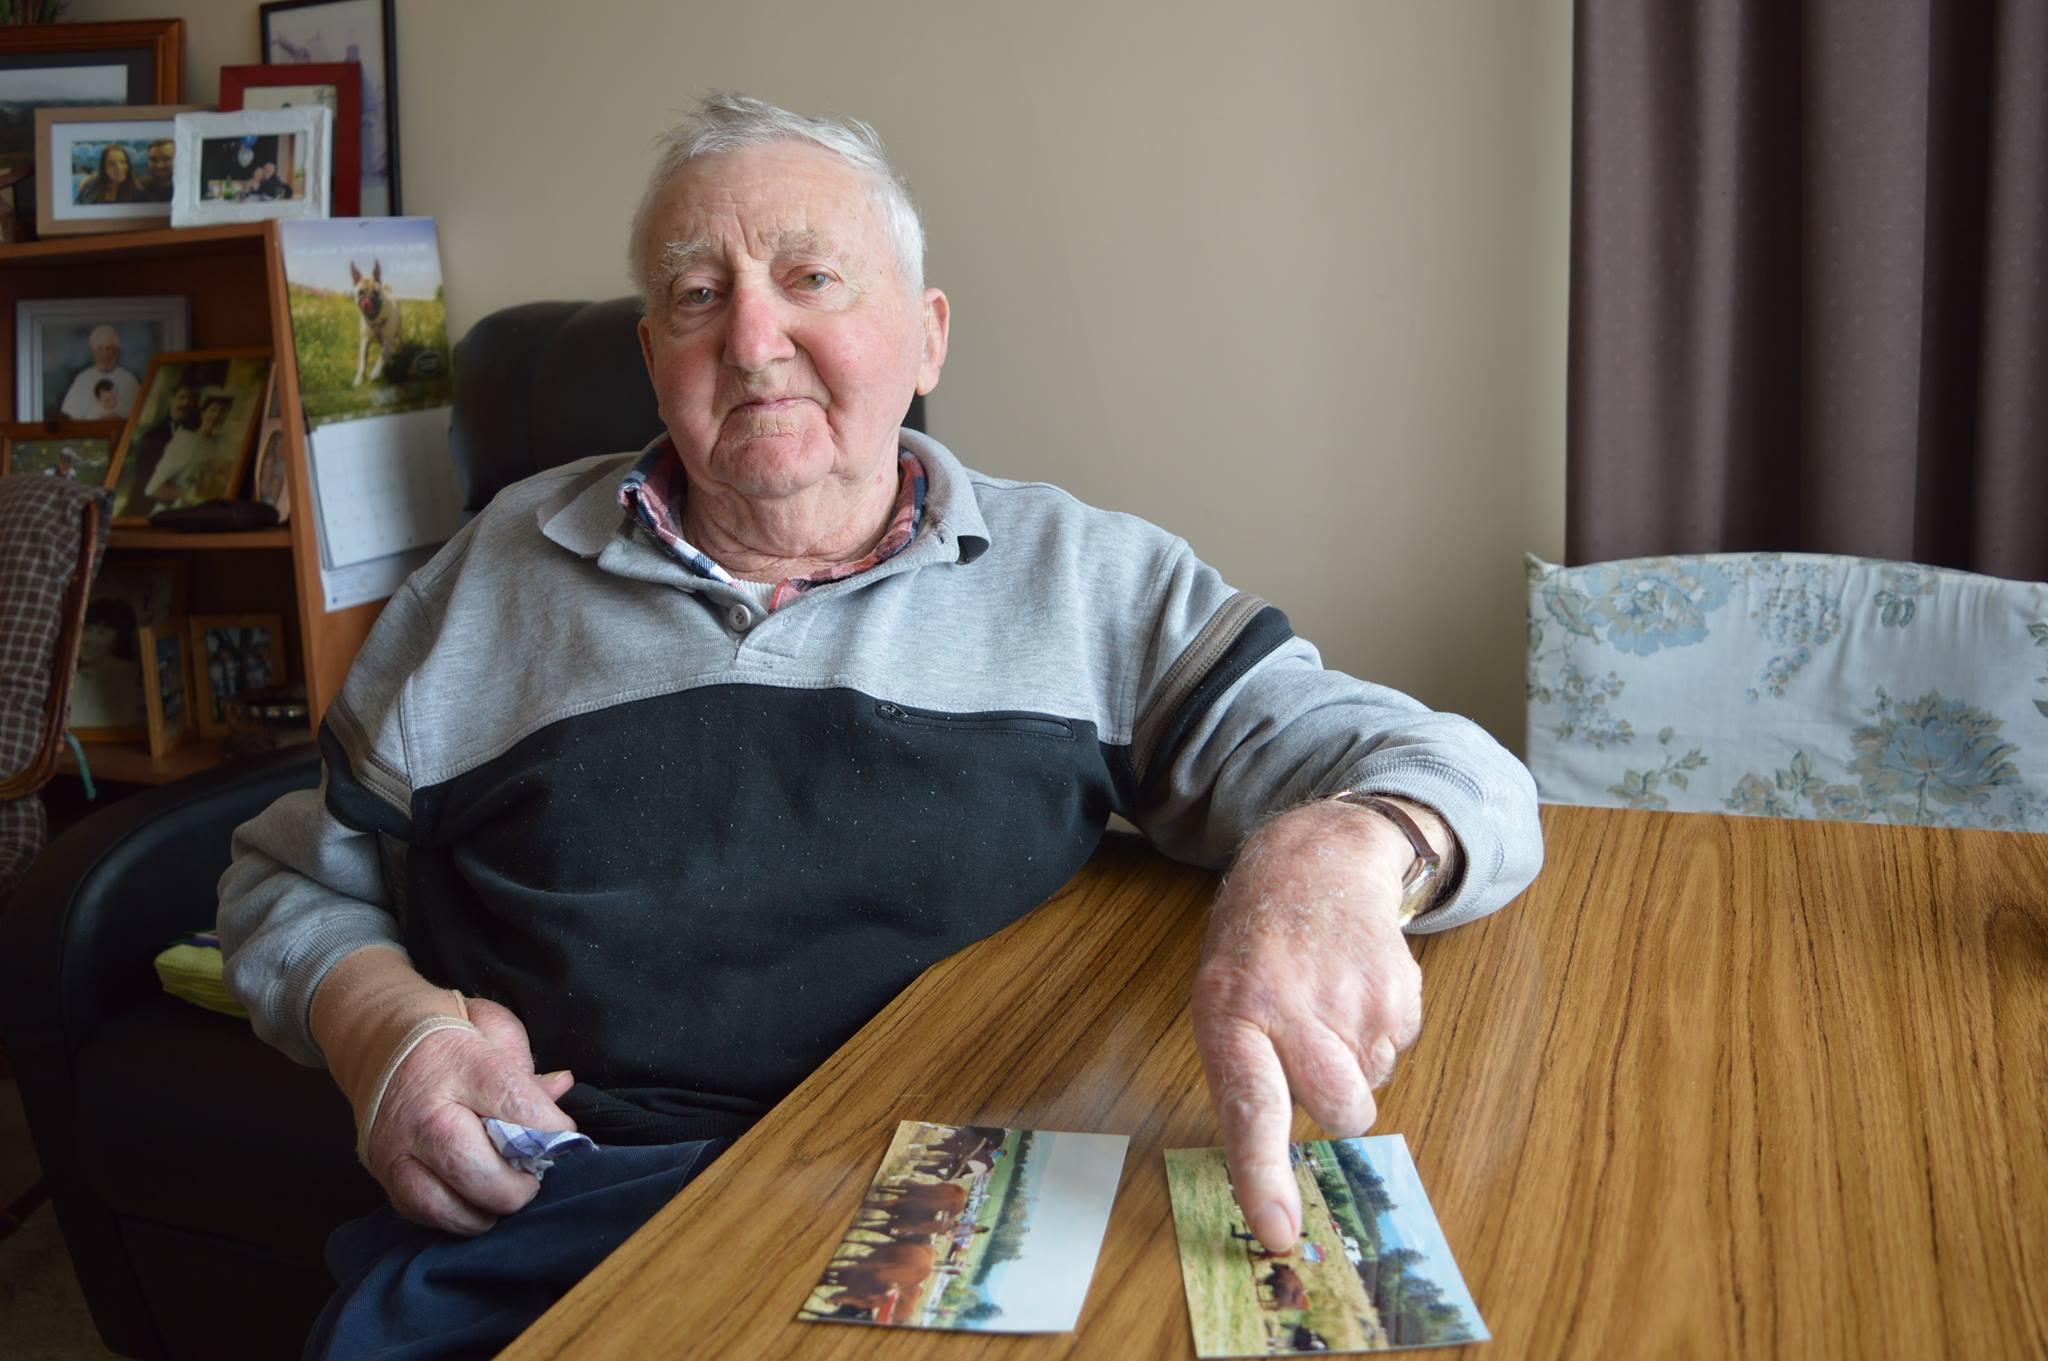 Rusty Richards recounts fond memories of a bullock league display in 1995